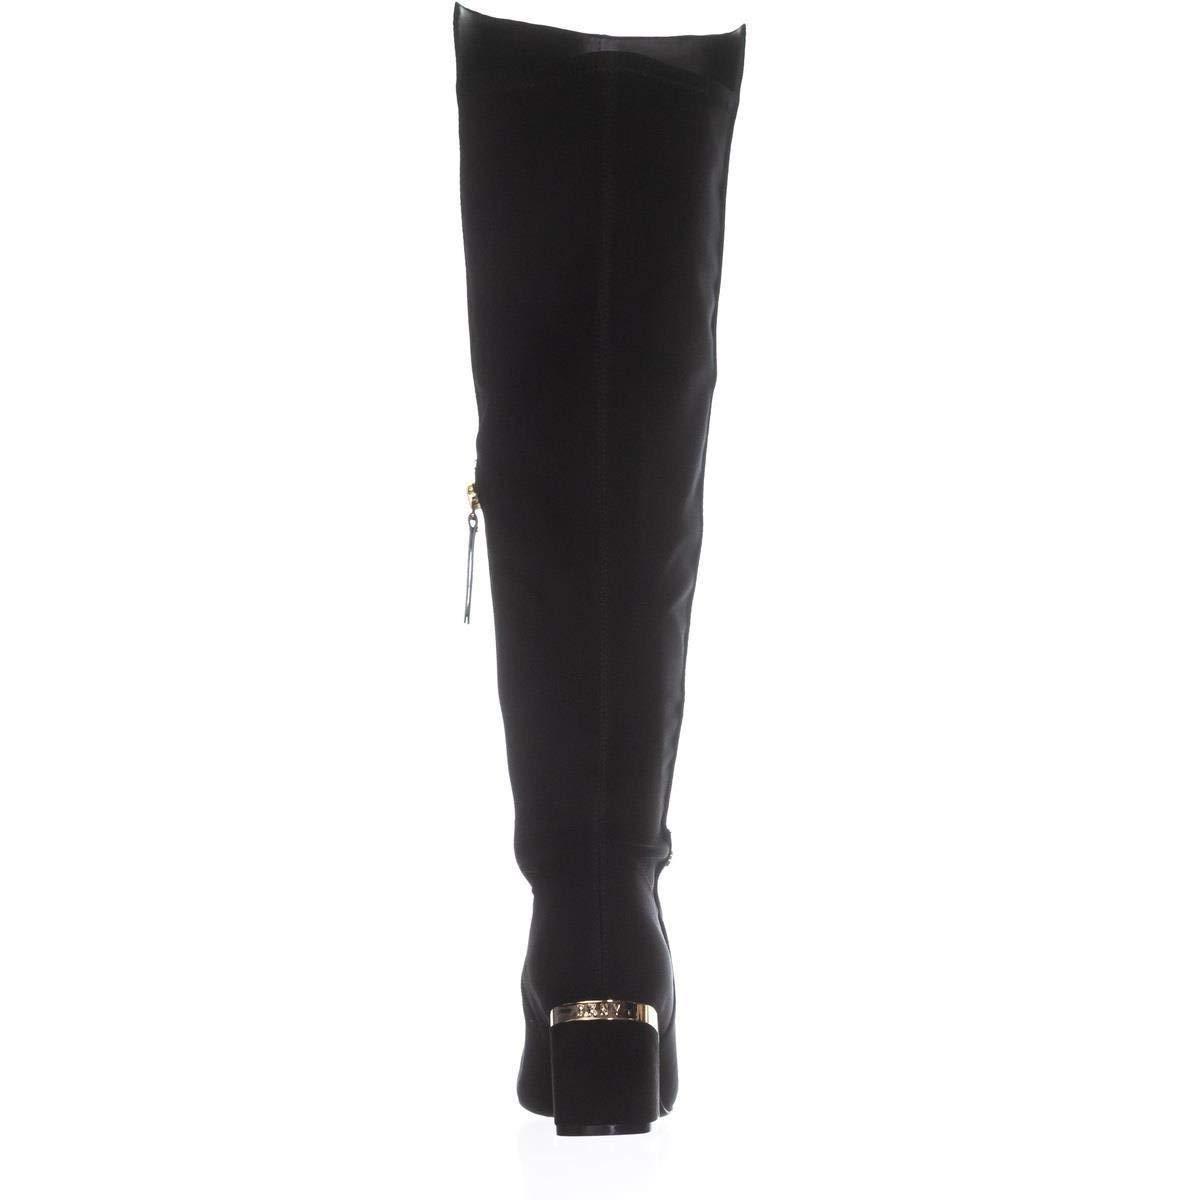 DKNY Cora Cora Cora Knee High Damen Stiefel Schwarz  1d62a9